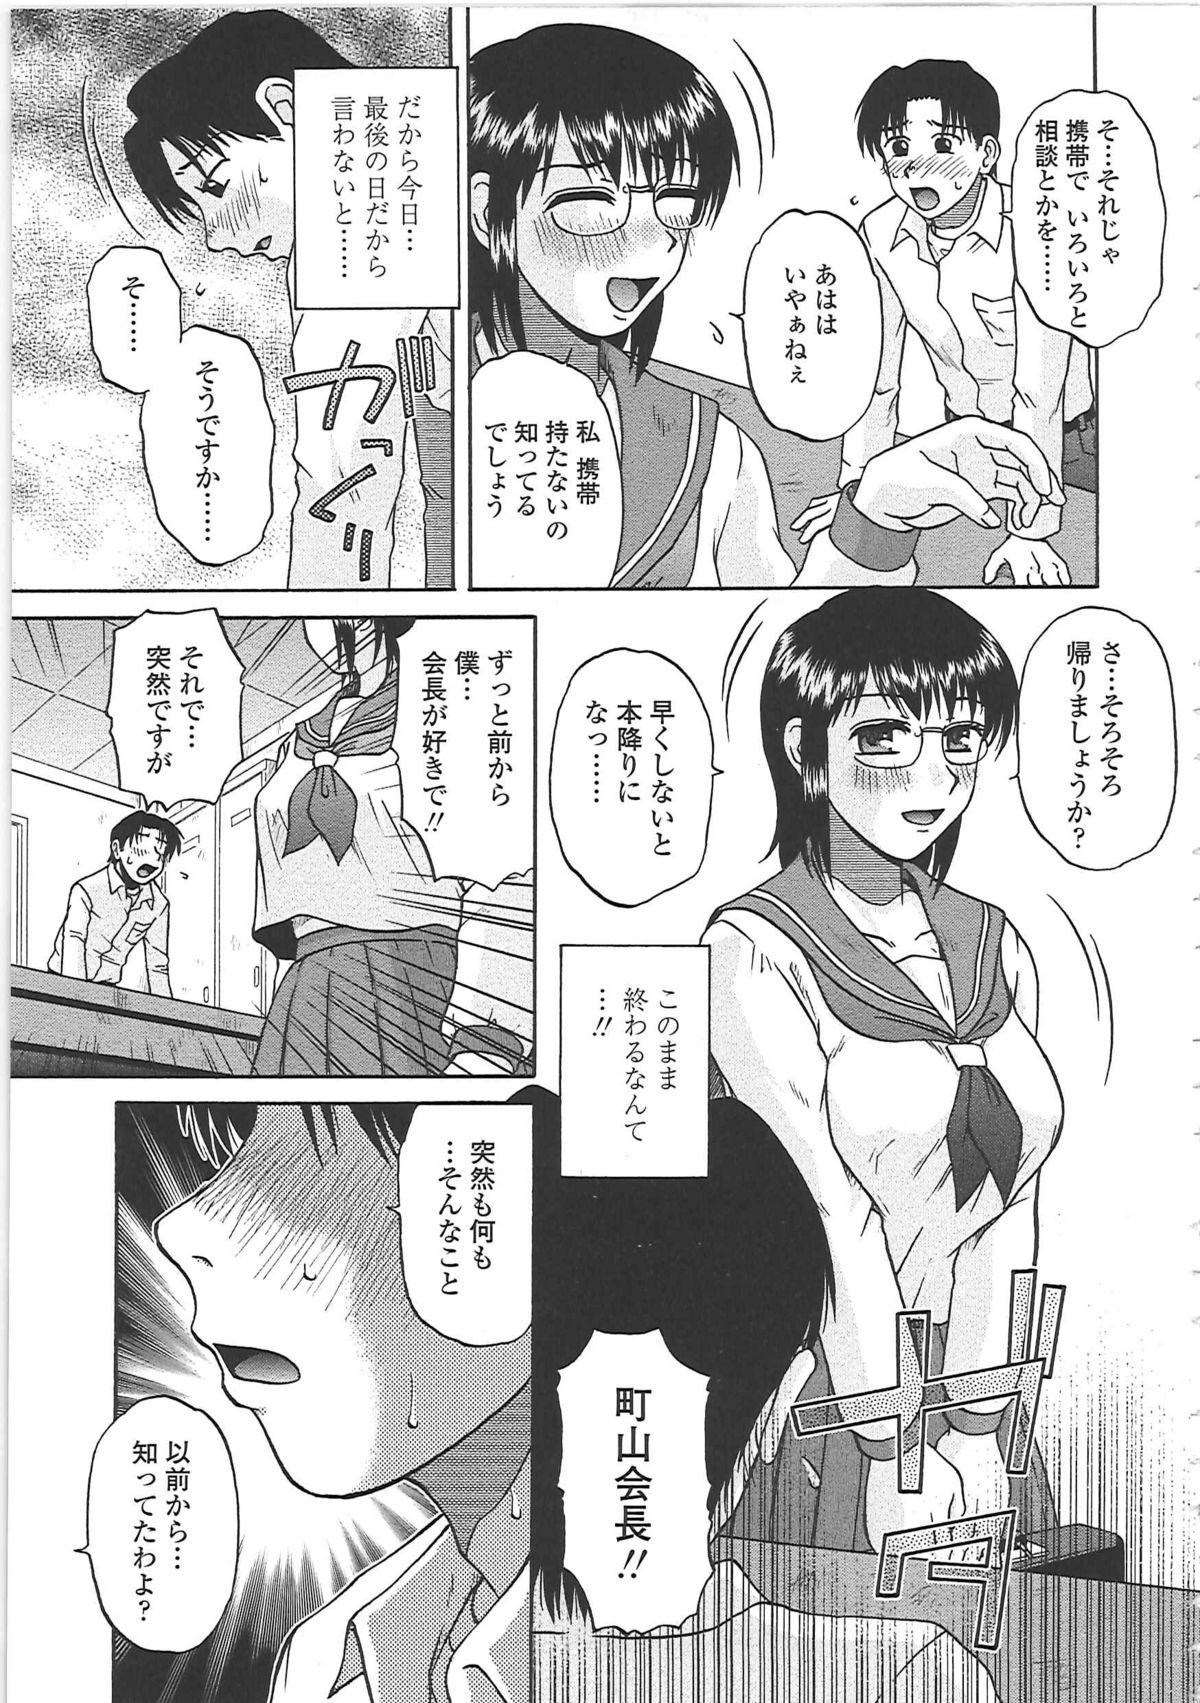 Nikuzuma Tsuushin - Erotic Wife Communication 81